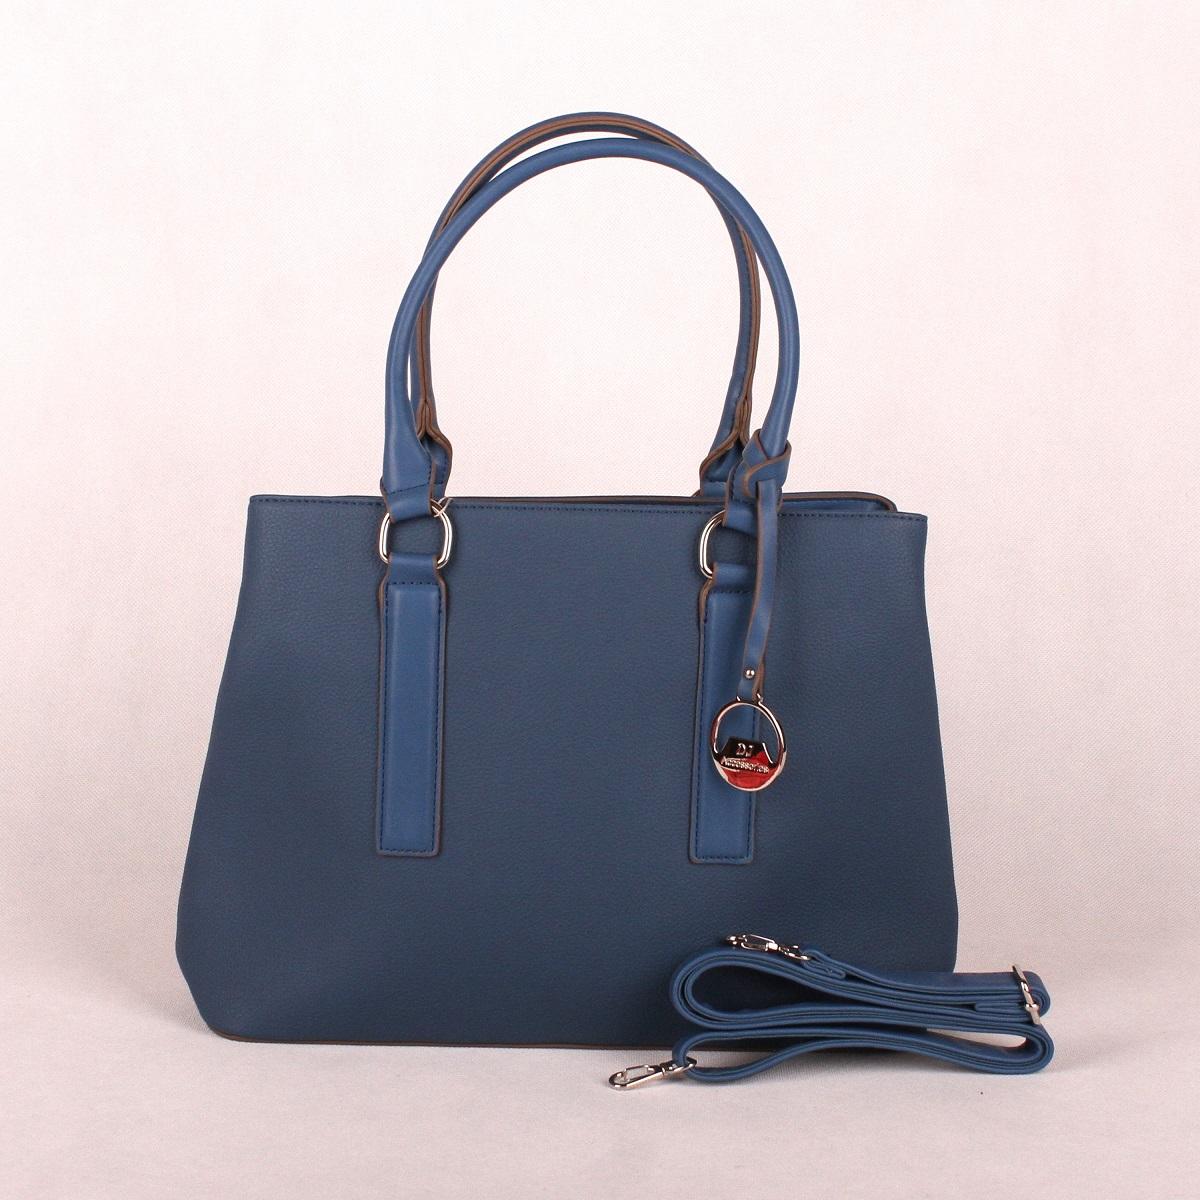 0481b247db5 Modrá kabelka do ruky David Jones CM3066